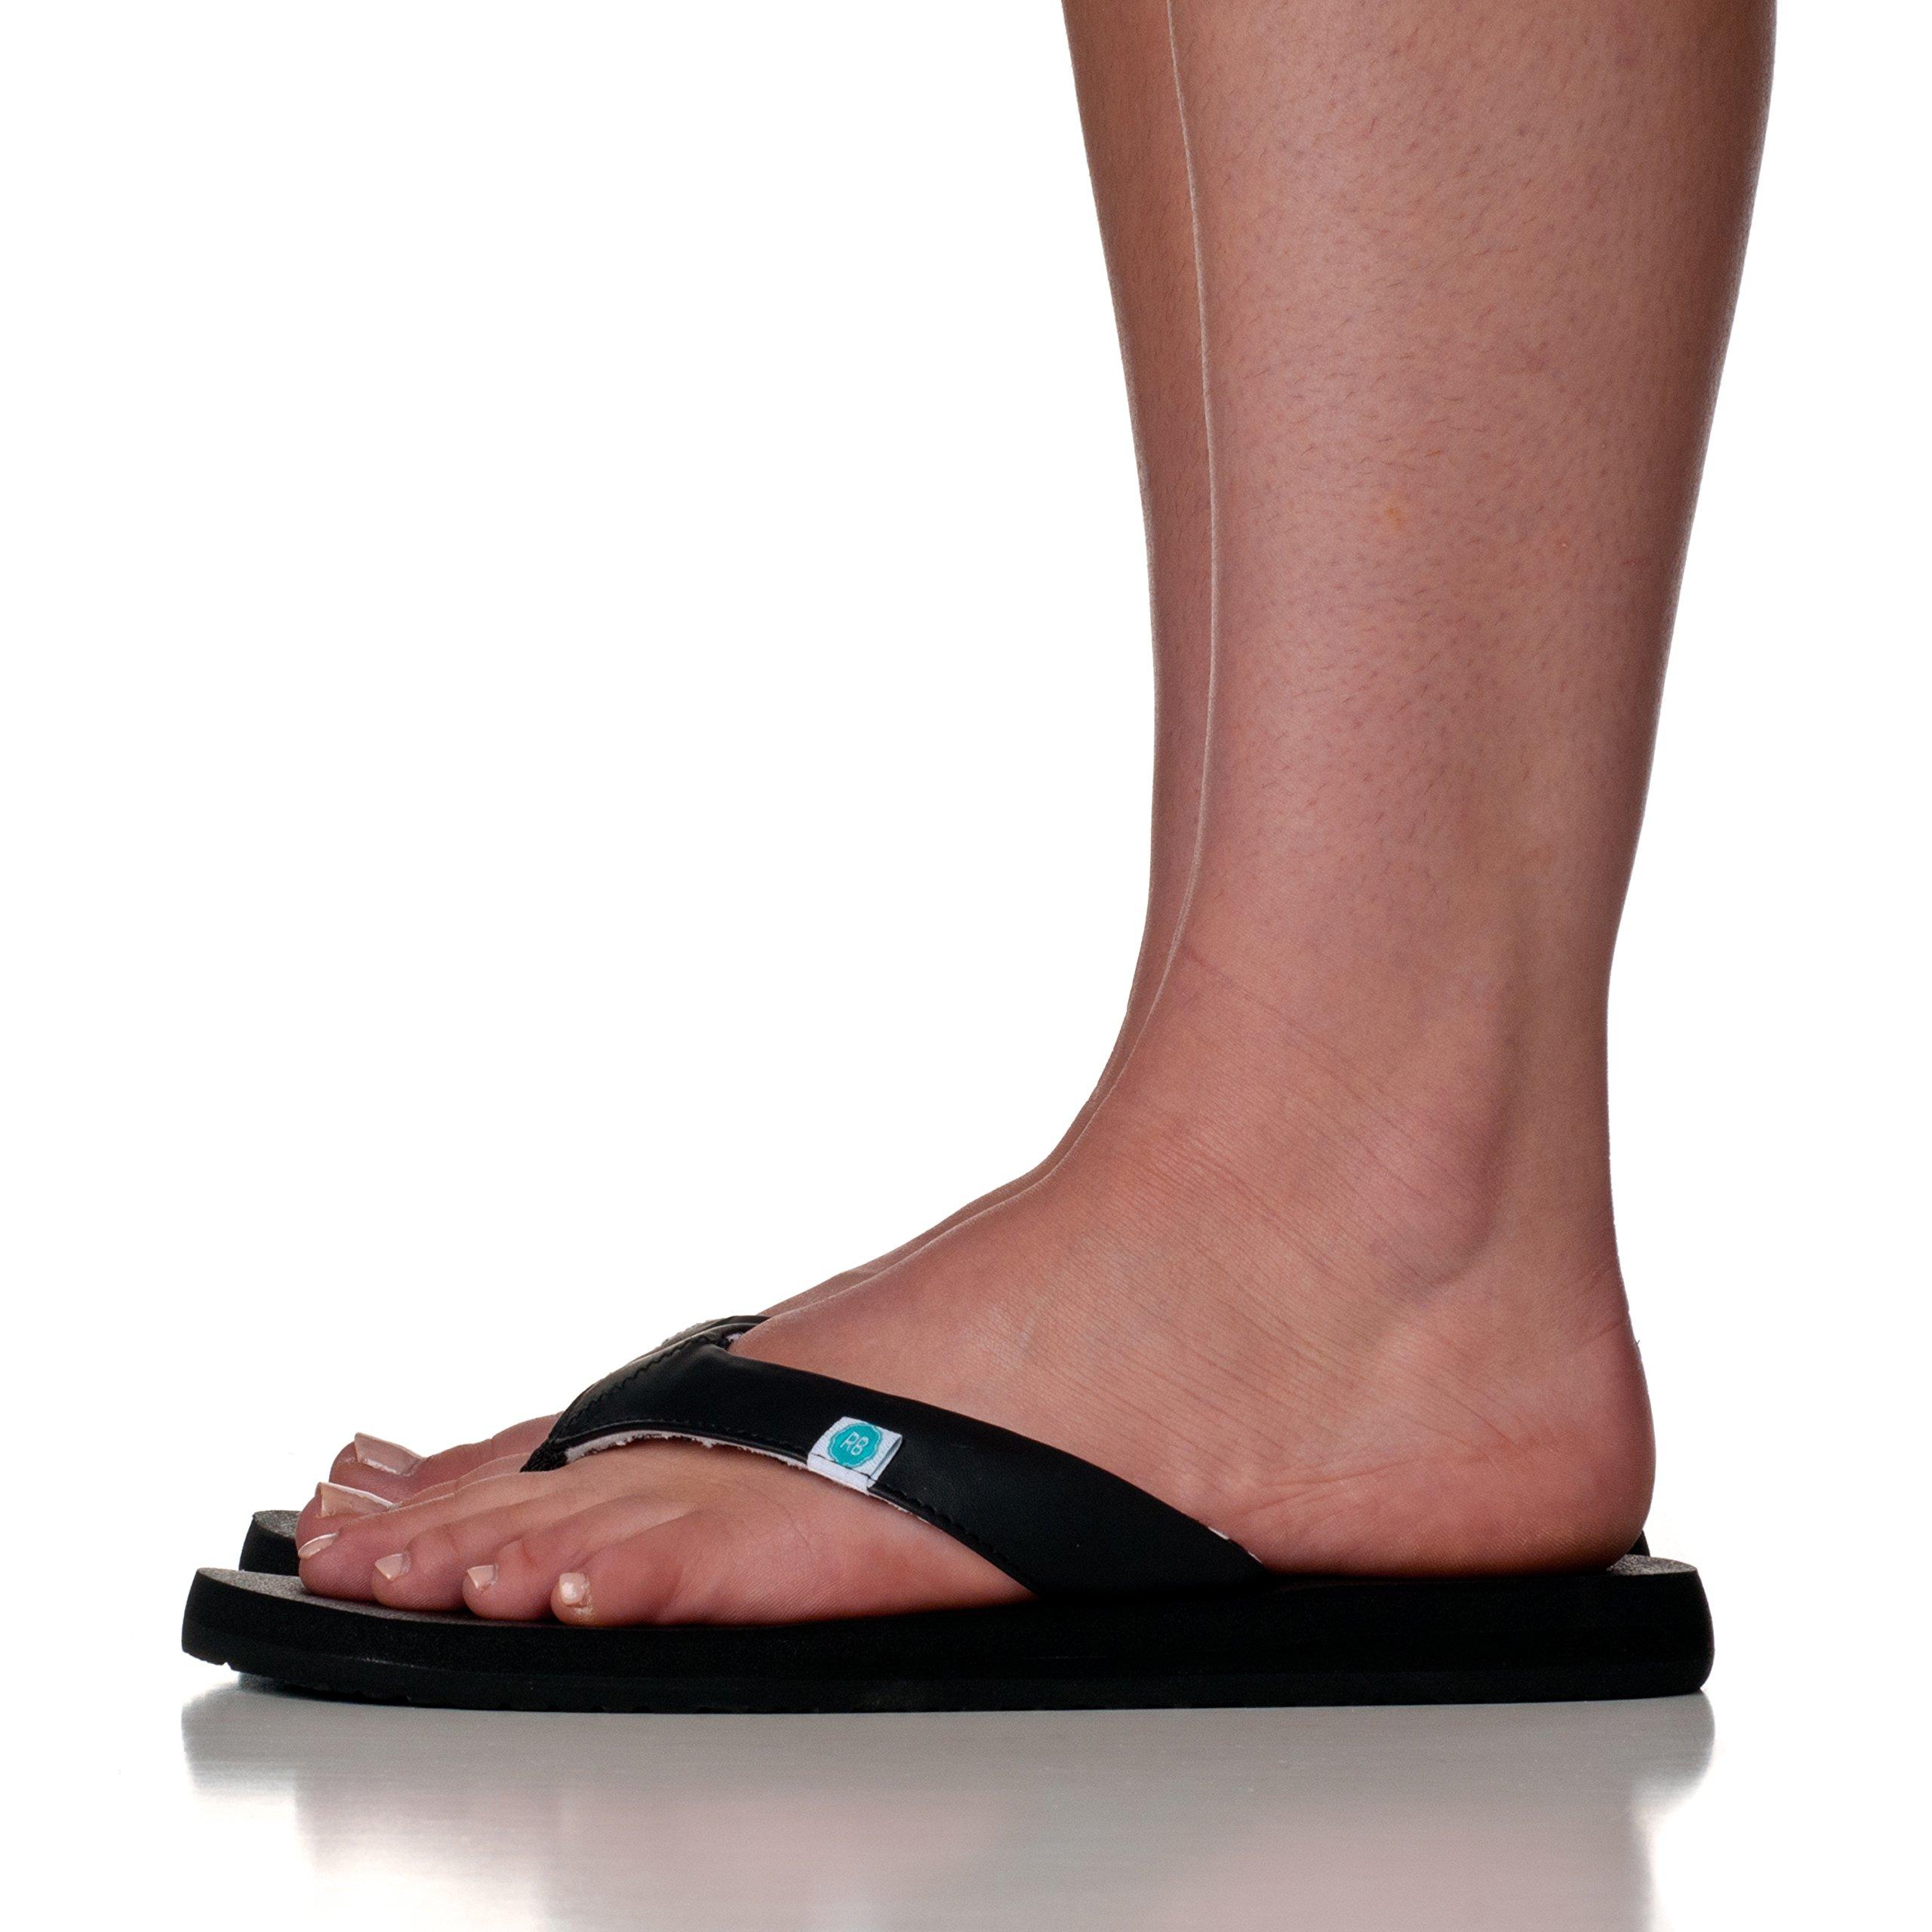 flip nordstrom all sanuk mat shoes c yoga baby flop mats kids